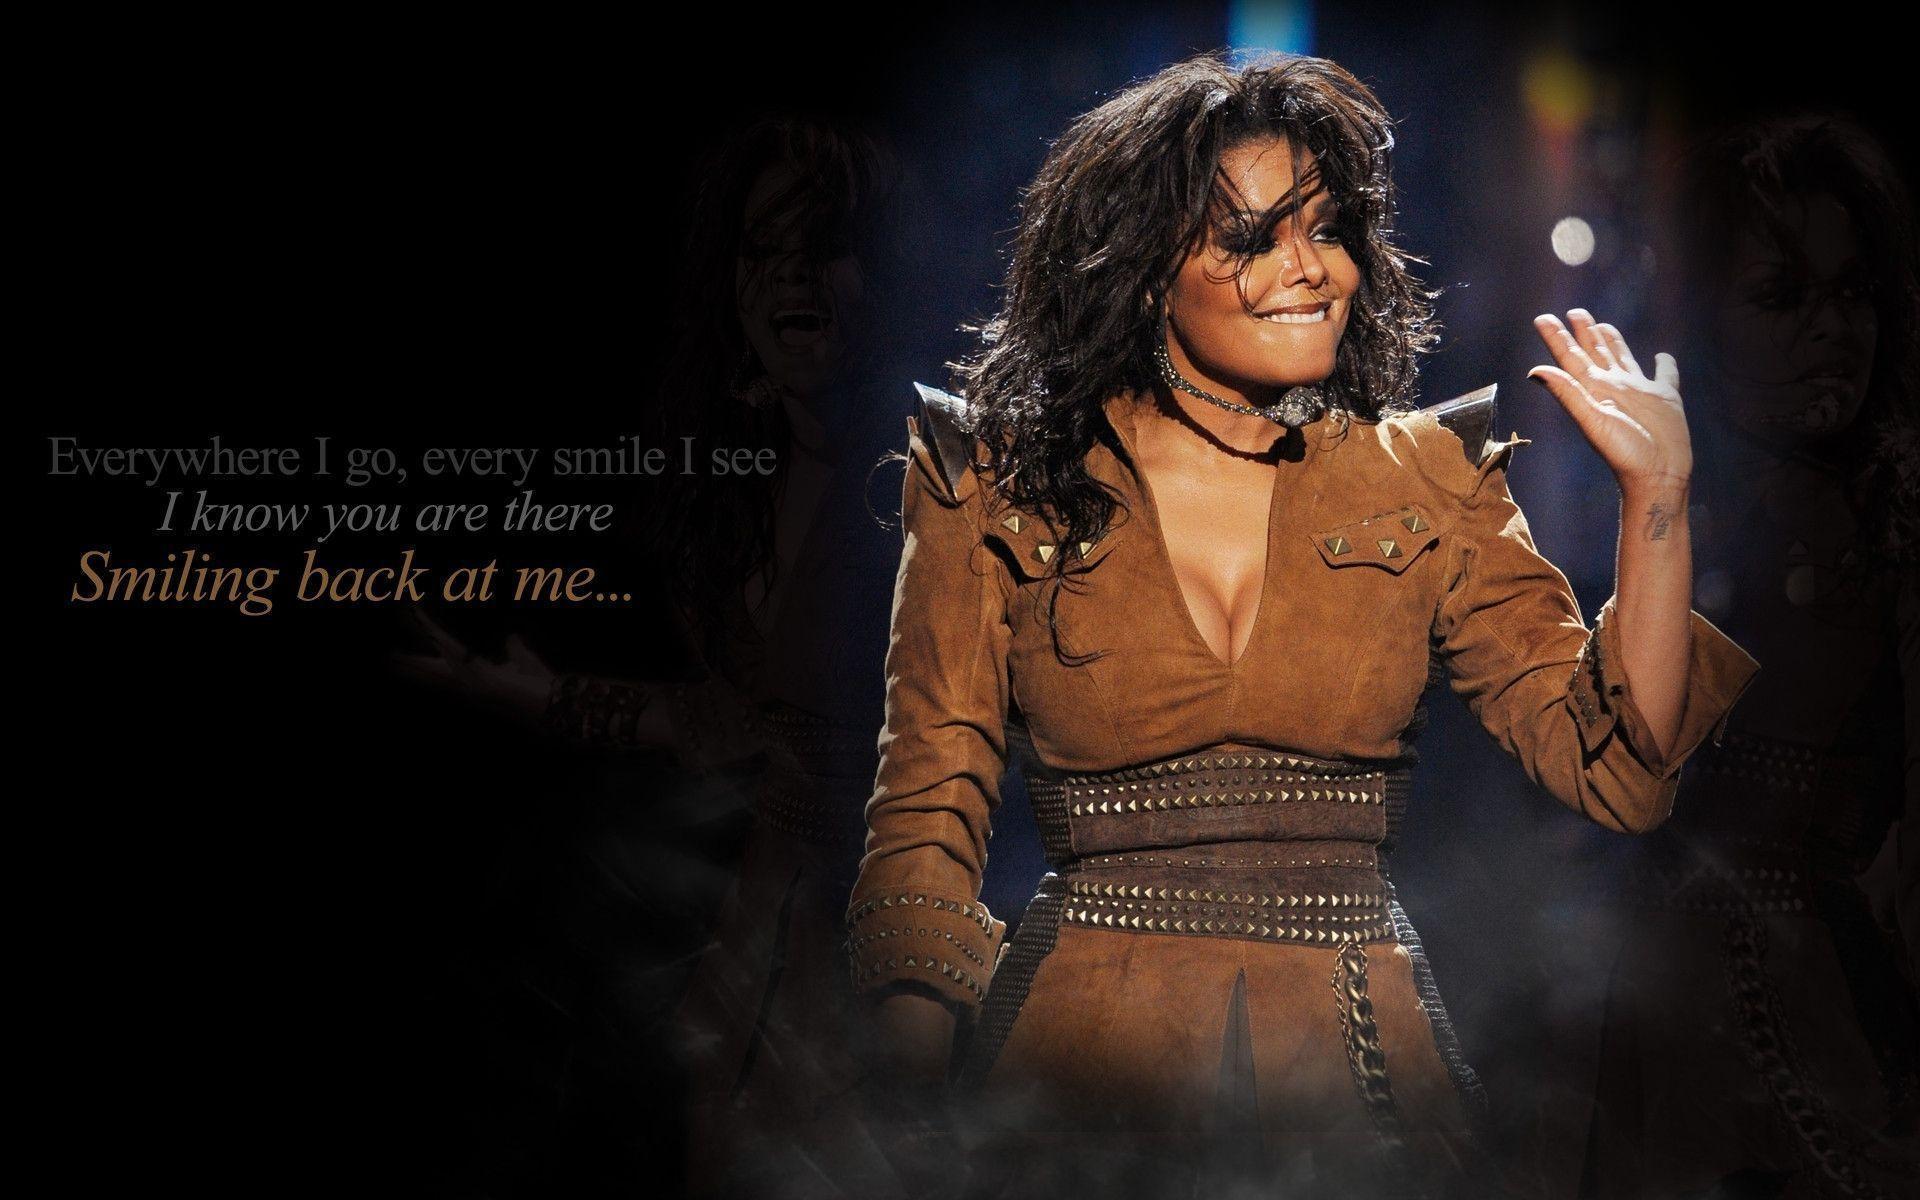 dfgd - Janet Jackson Wallpaper (12743431) - Fanpop